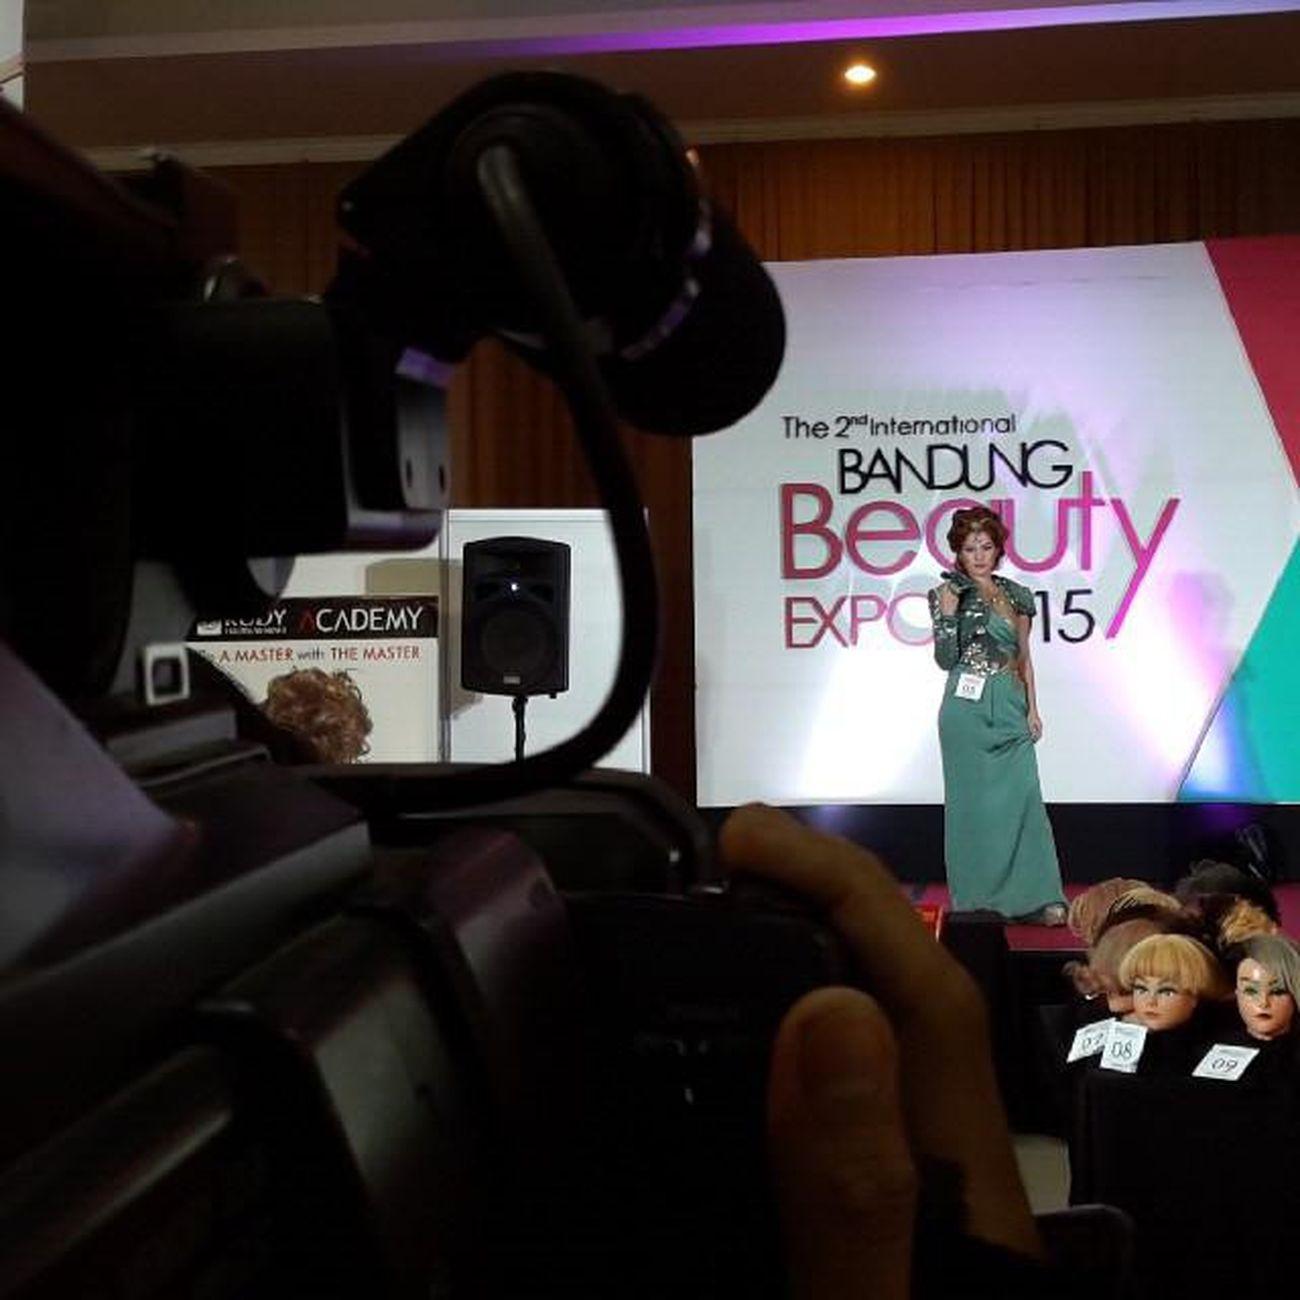 Graduation Day Rudy Hadisuwarno School di Bandung Beauty Expo 2015 Televisinet INDONESIA Bandung EventBandung Event Indonettv Rudyhadisuwarno Fashion Fashionshow